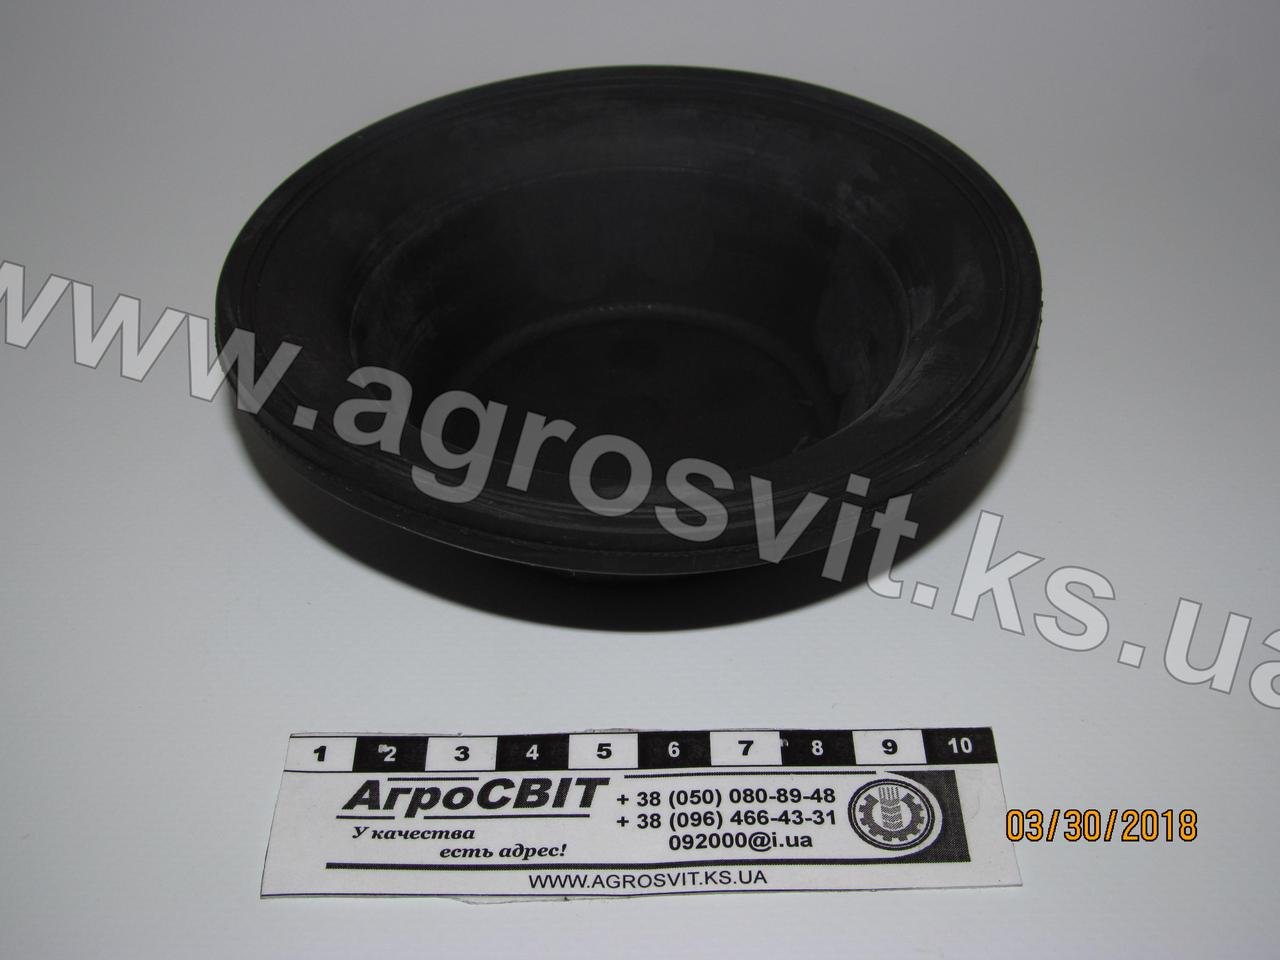 Диафрагма тип 9 Euro (глубокая), кат. № RD 095-9D